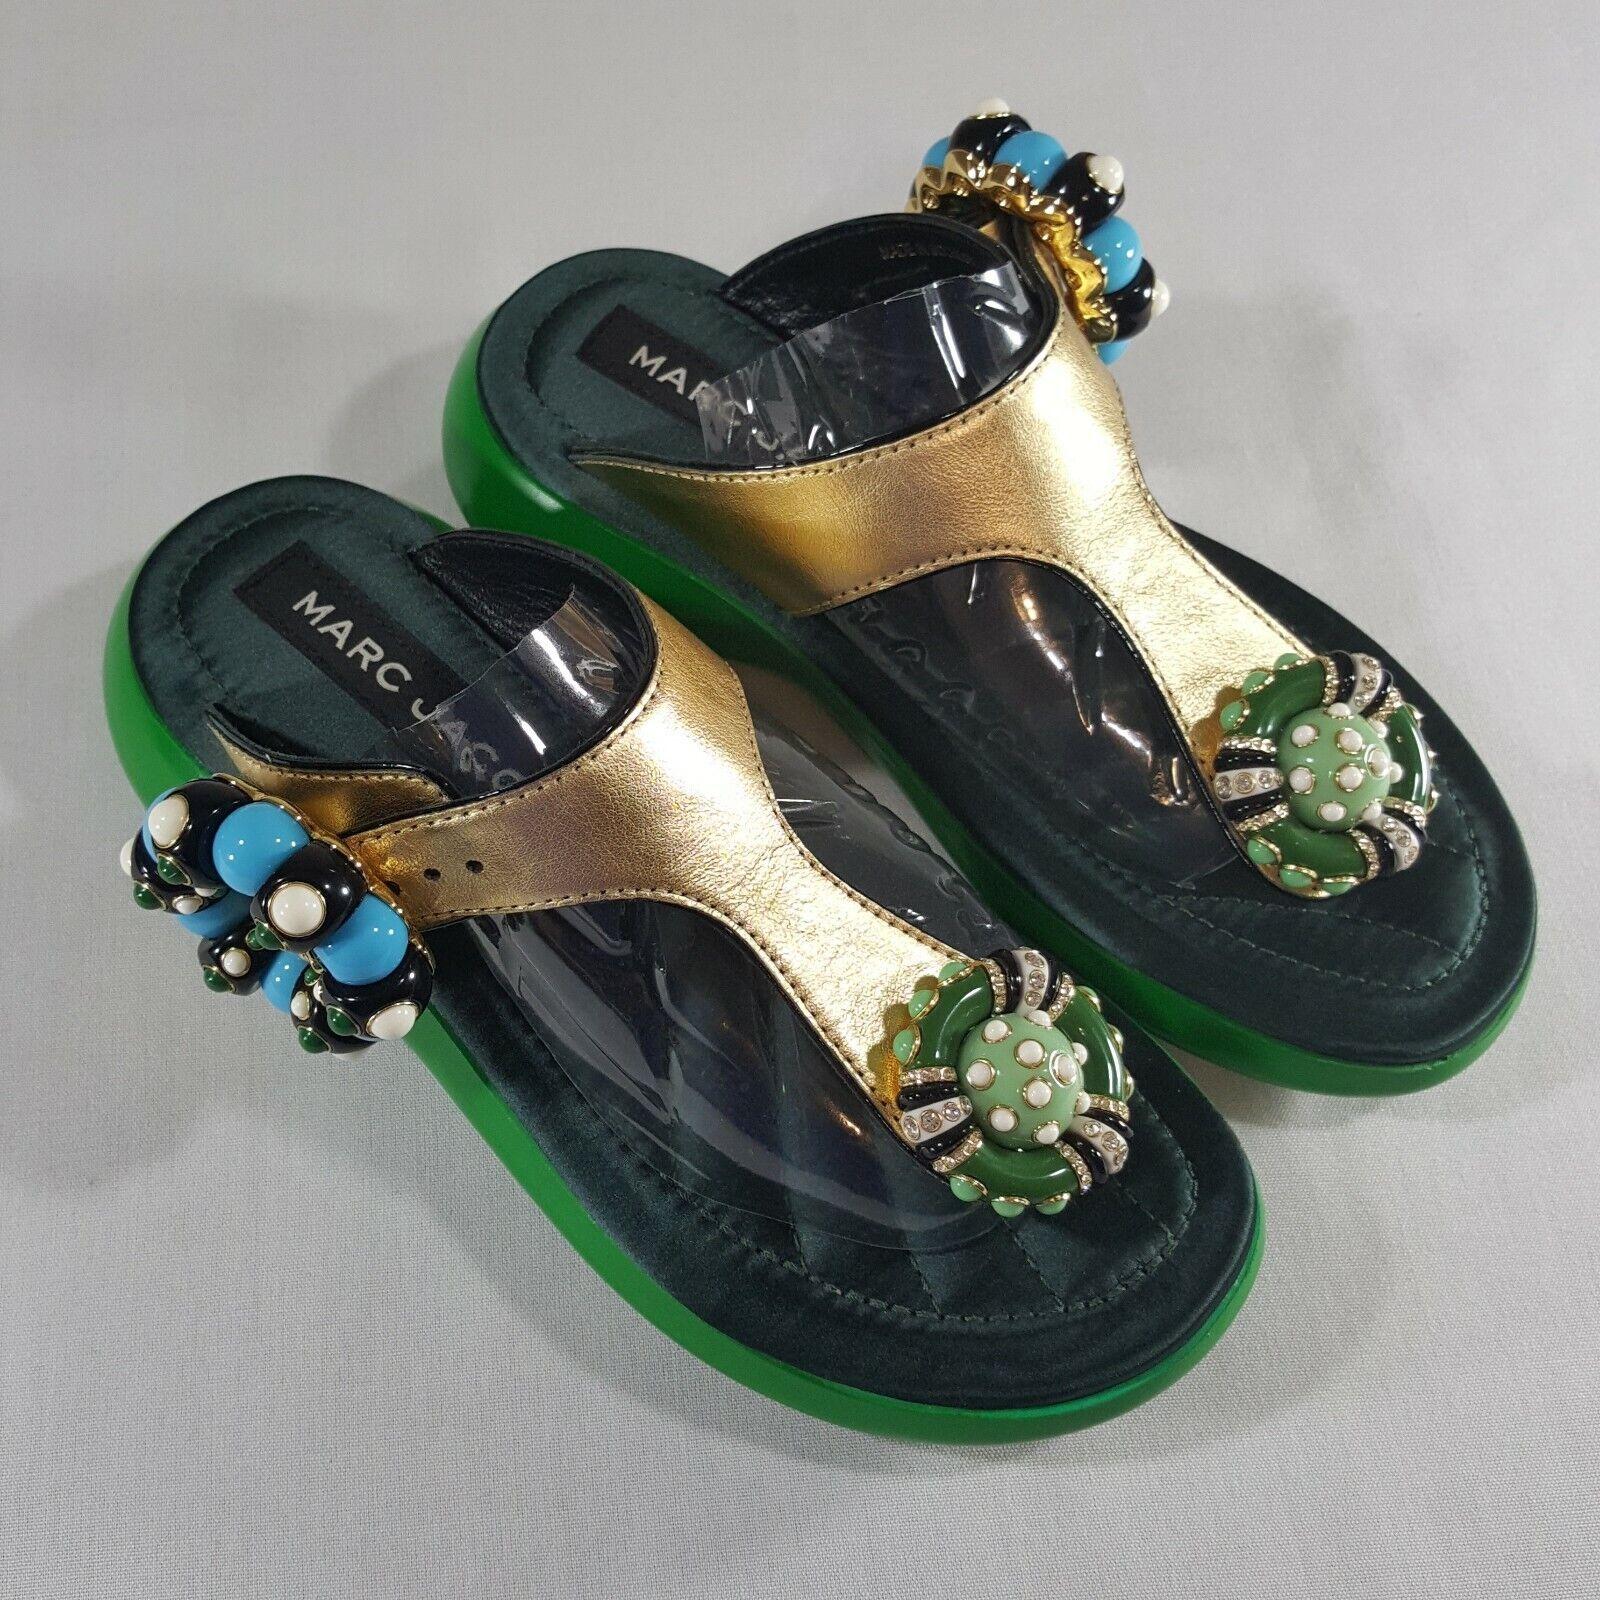 NUOVO Marc  Jacobs donna Mabel Emellited Sandal Flat Slide Platform oro Sz 37  prezzi più convenienti